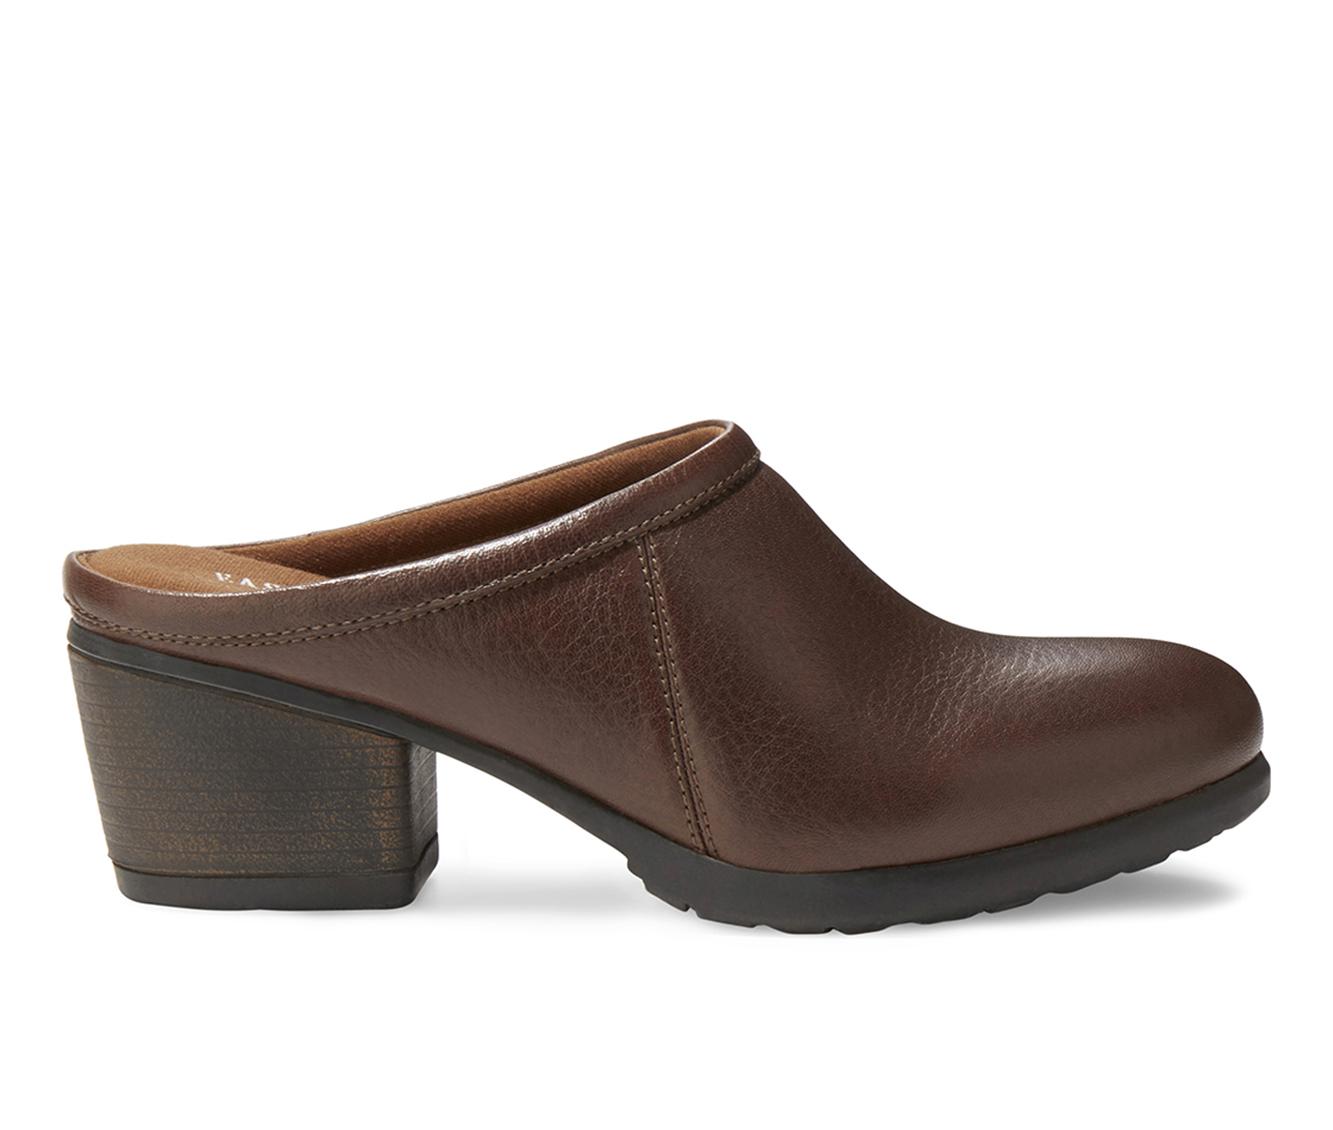 Eastland Paige Women's Shoe (Brown Leather)